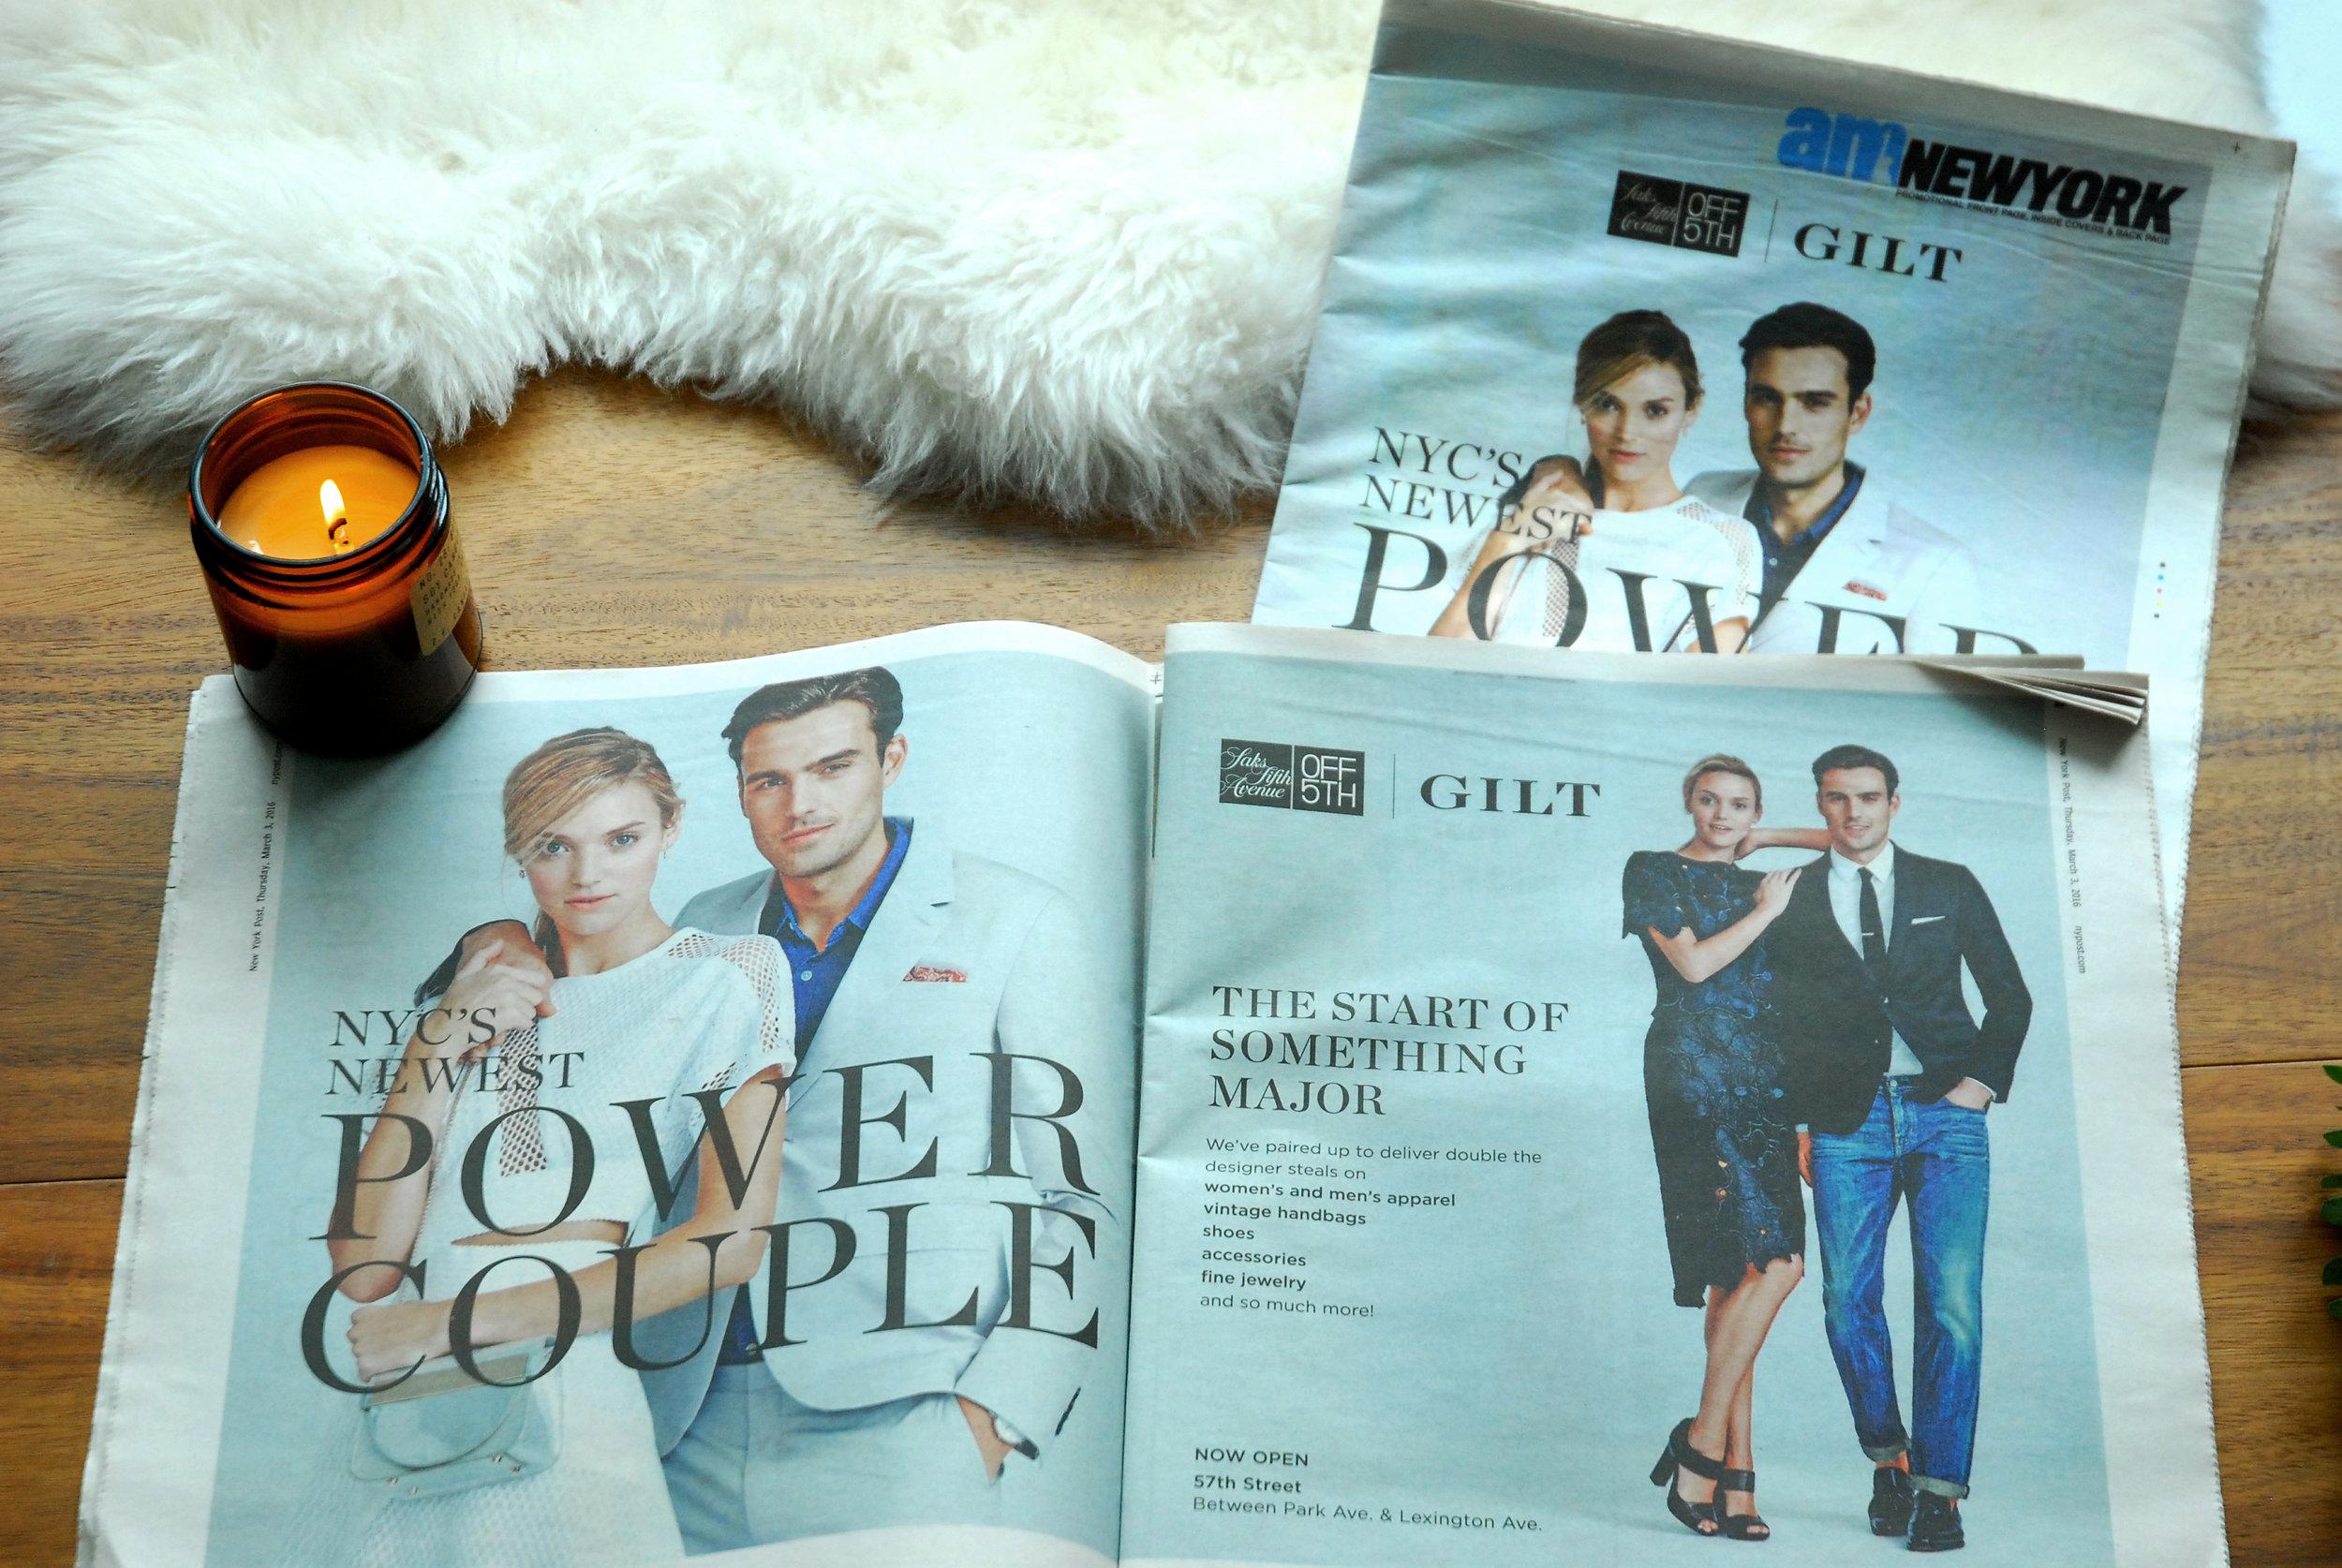 PC_news paper ad_01.jpg